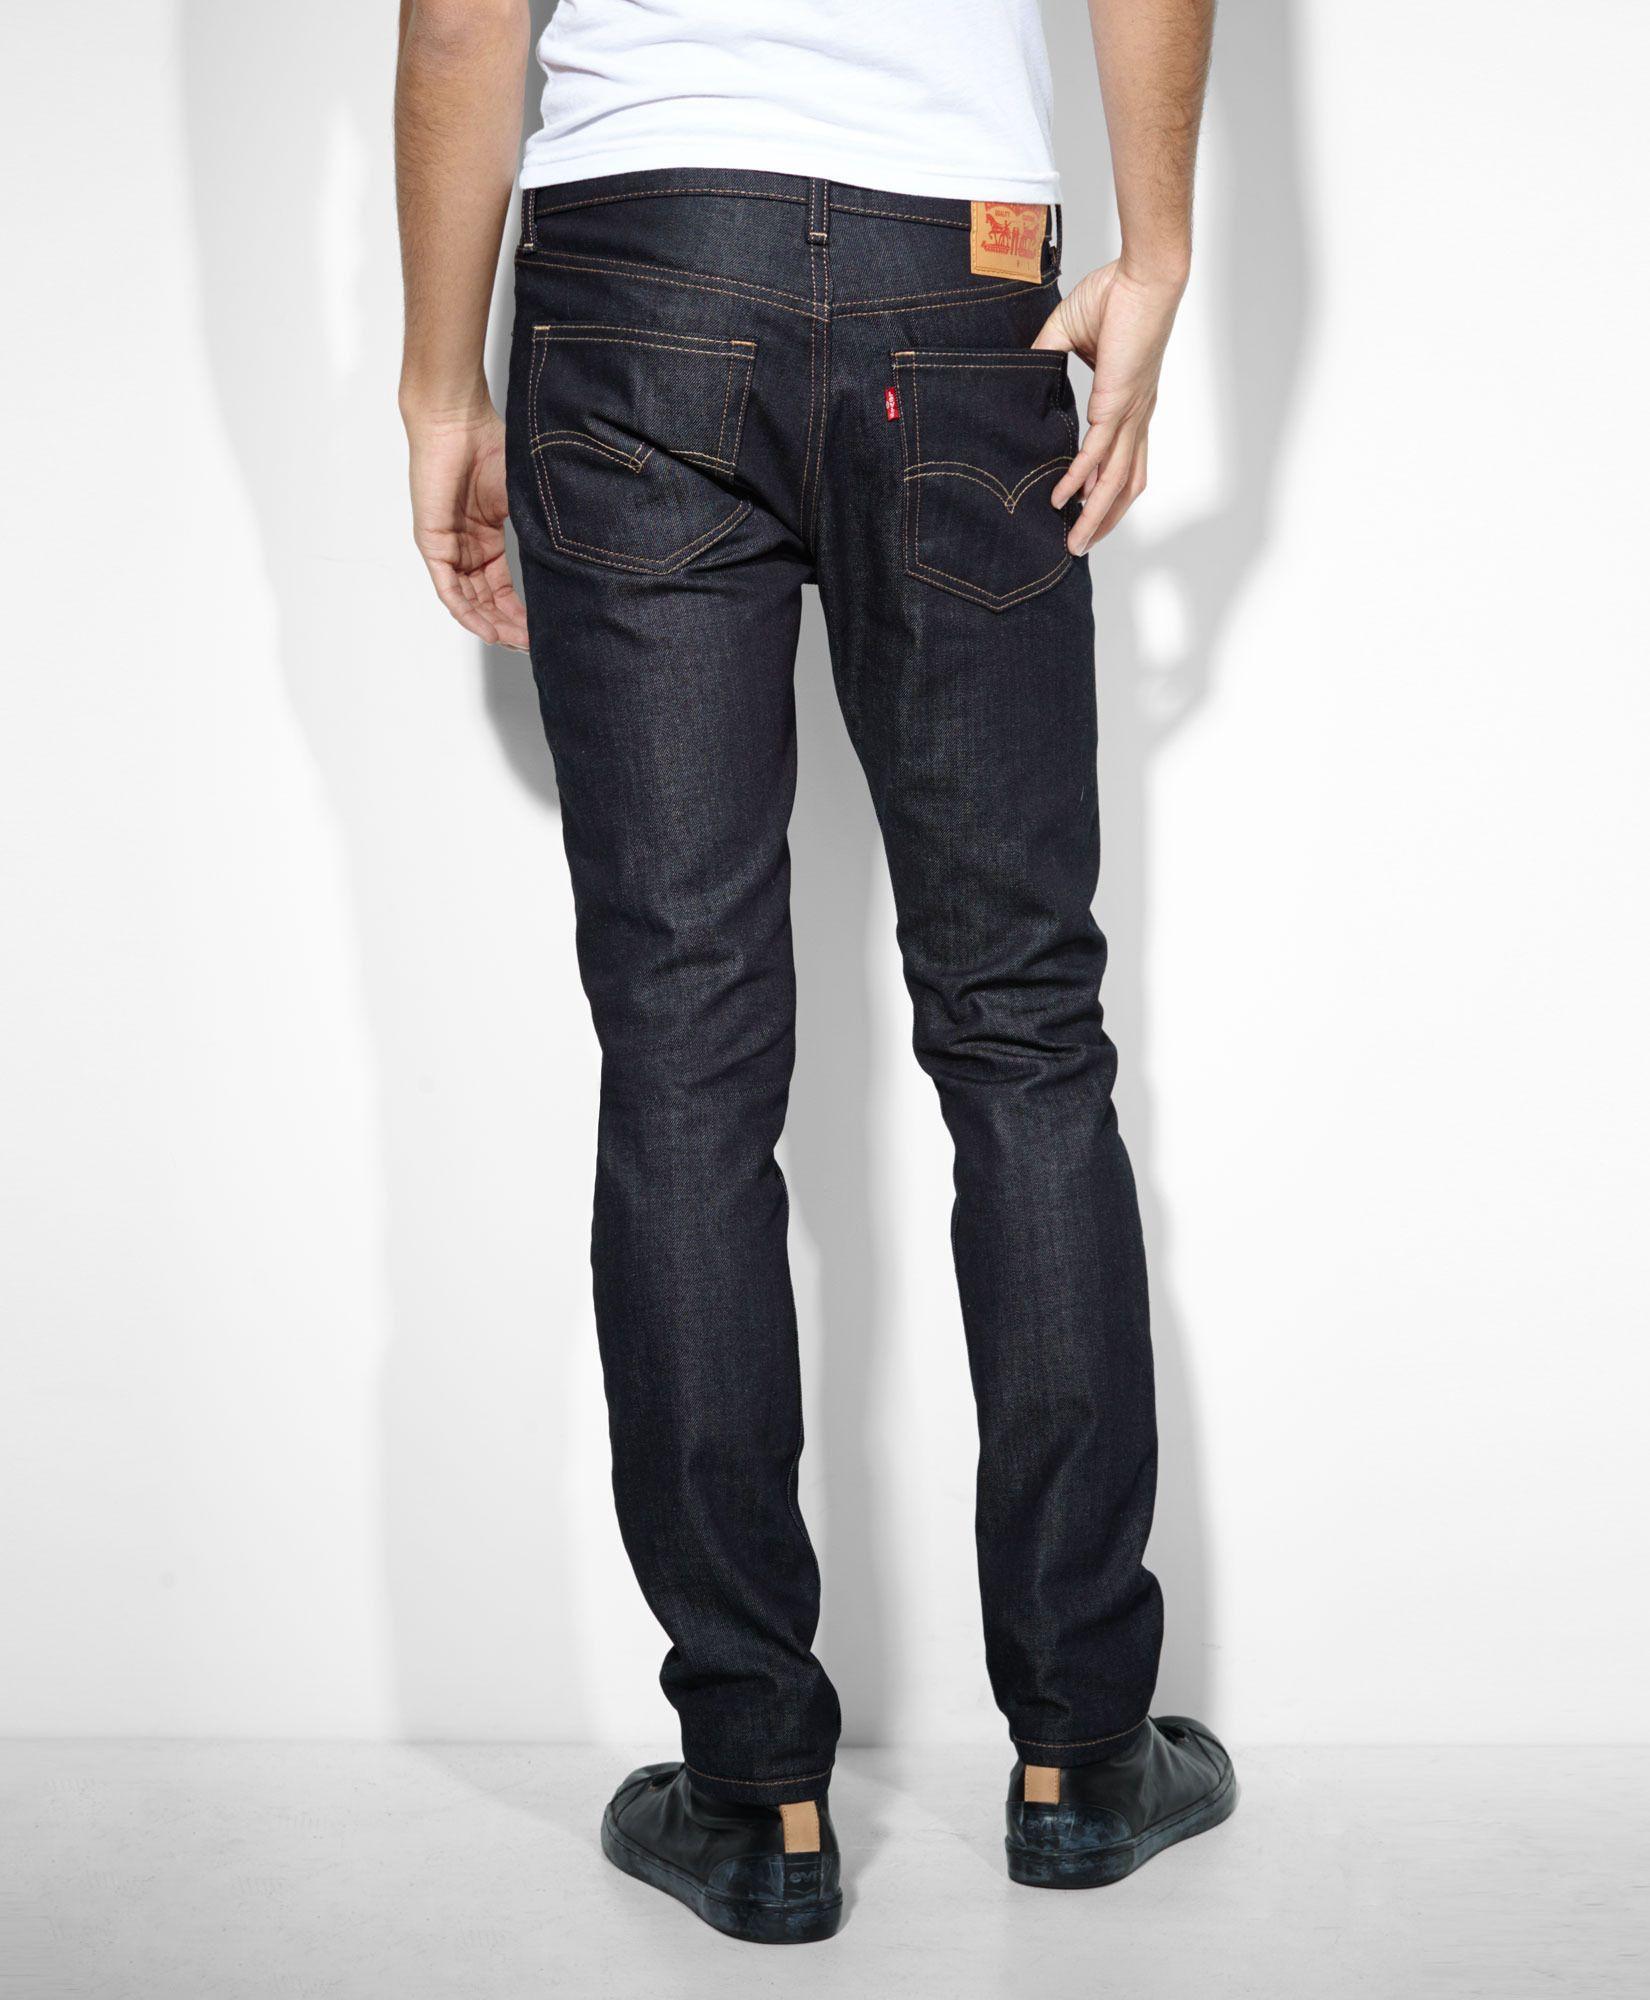 510™ Skinny Fit Stretch Jeans